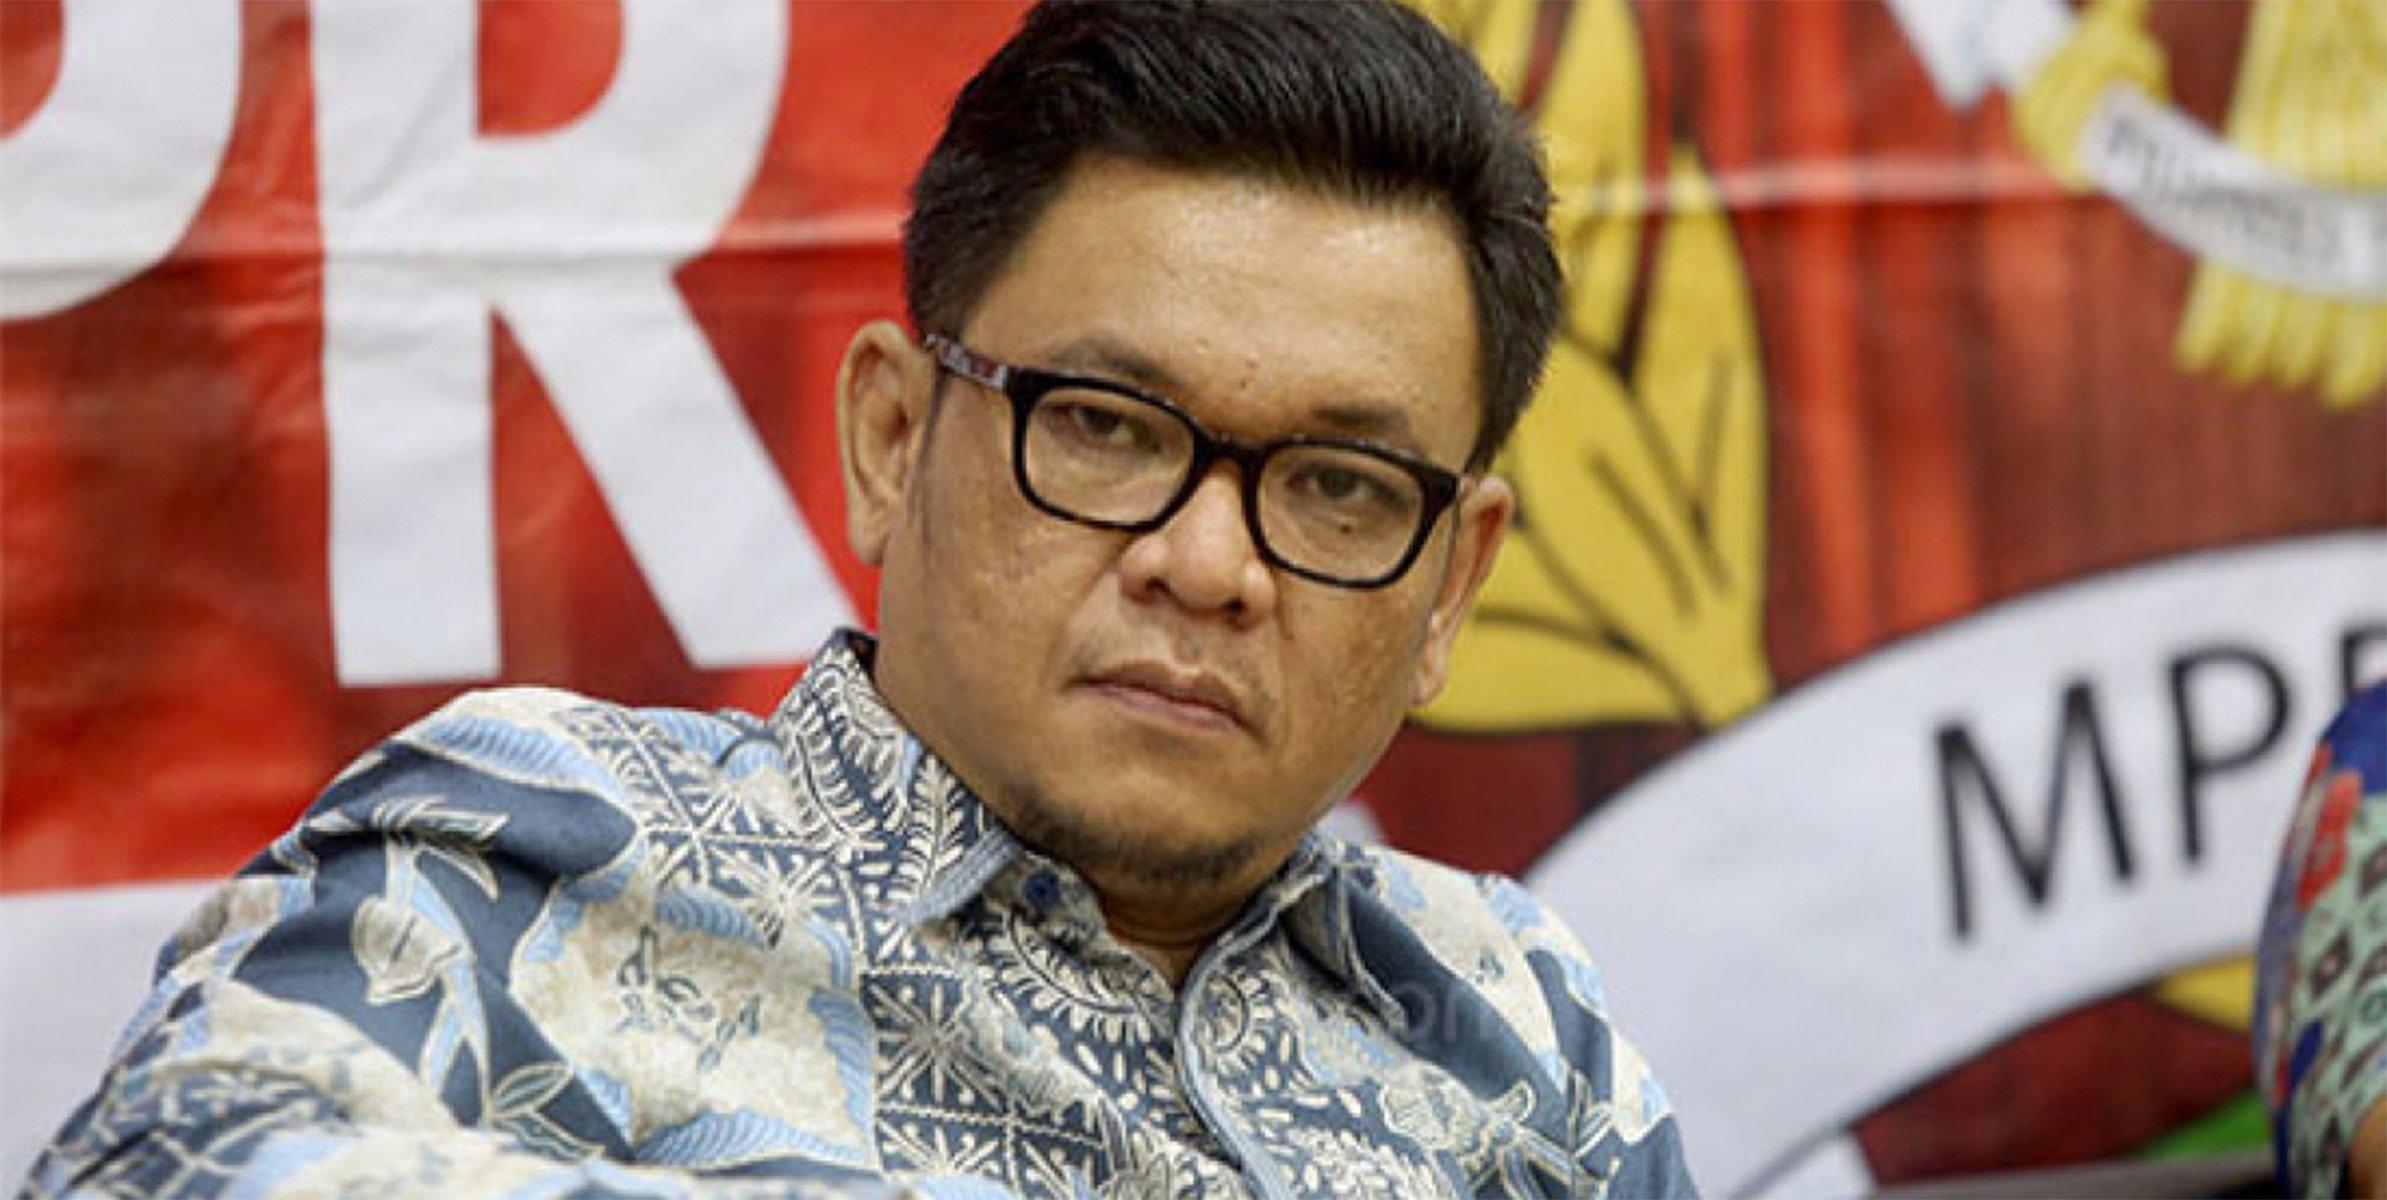 Polemik Sertifikasi Penceramah, Kang Ace: Serahkan Saja ke MUI, NU atau Muhammadiyah - JPNN.com